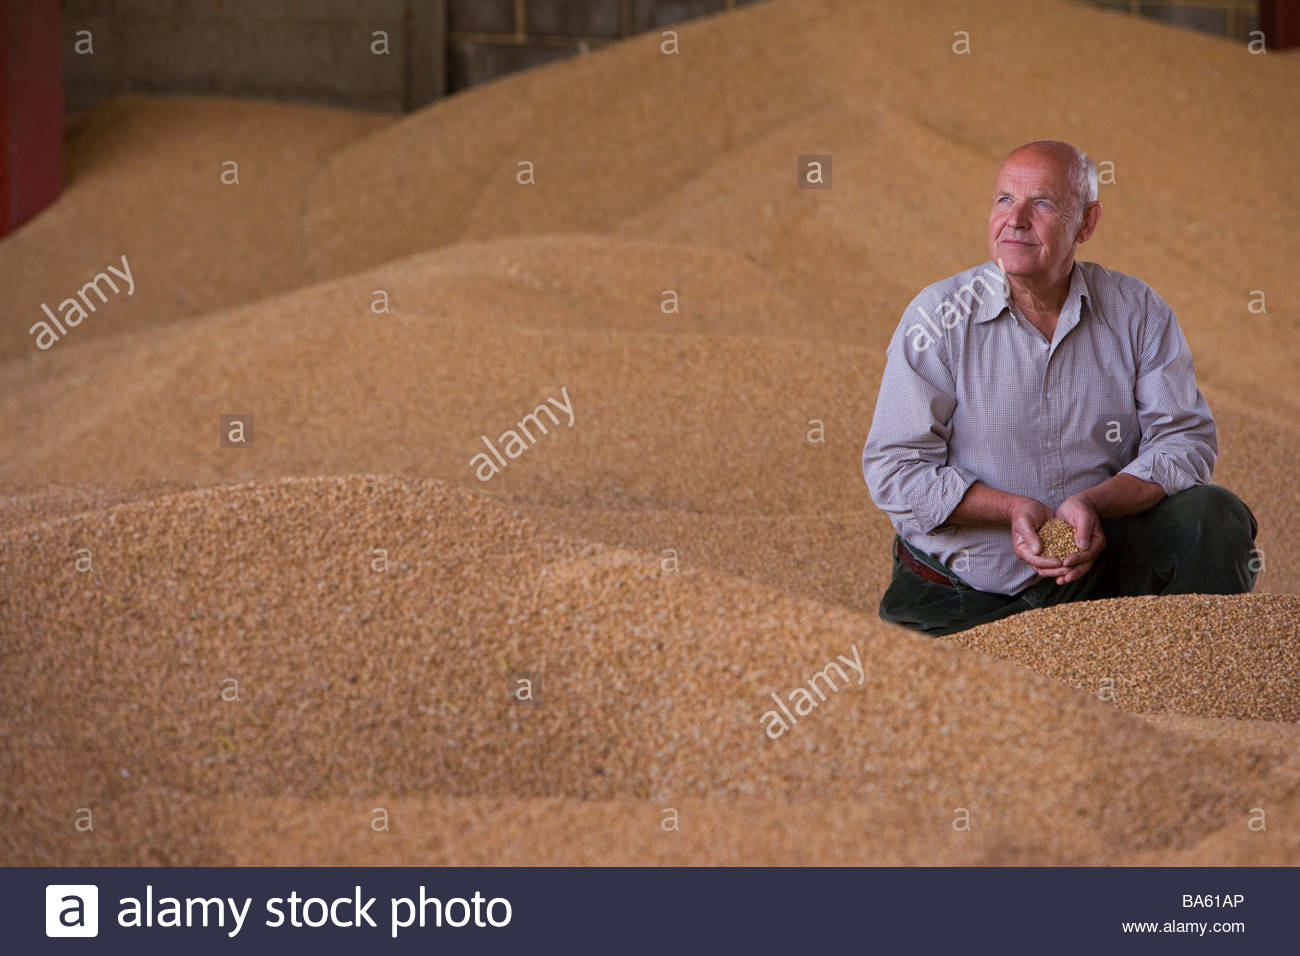 Farmer cupping wheat grains on grain heap - Stock Image